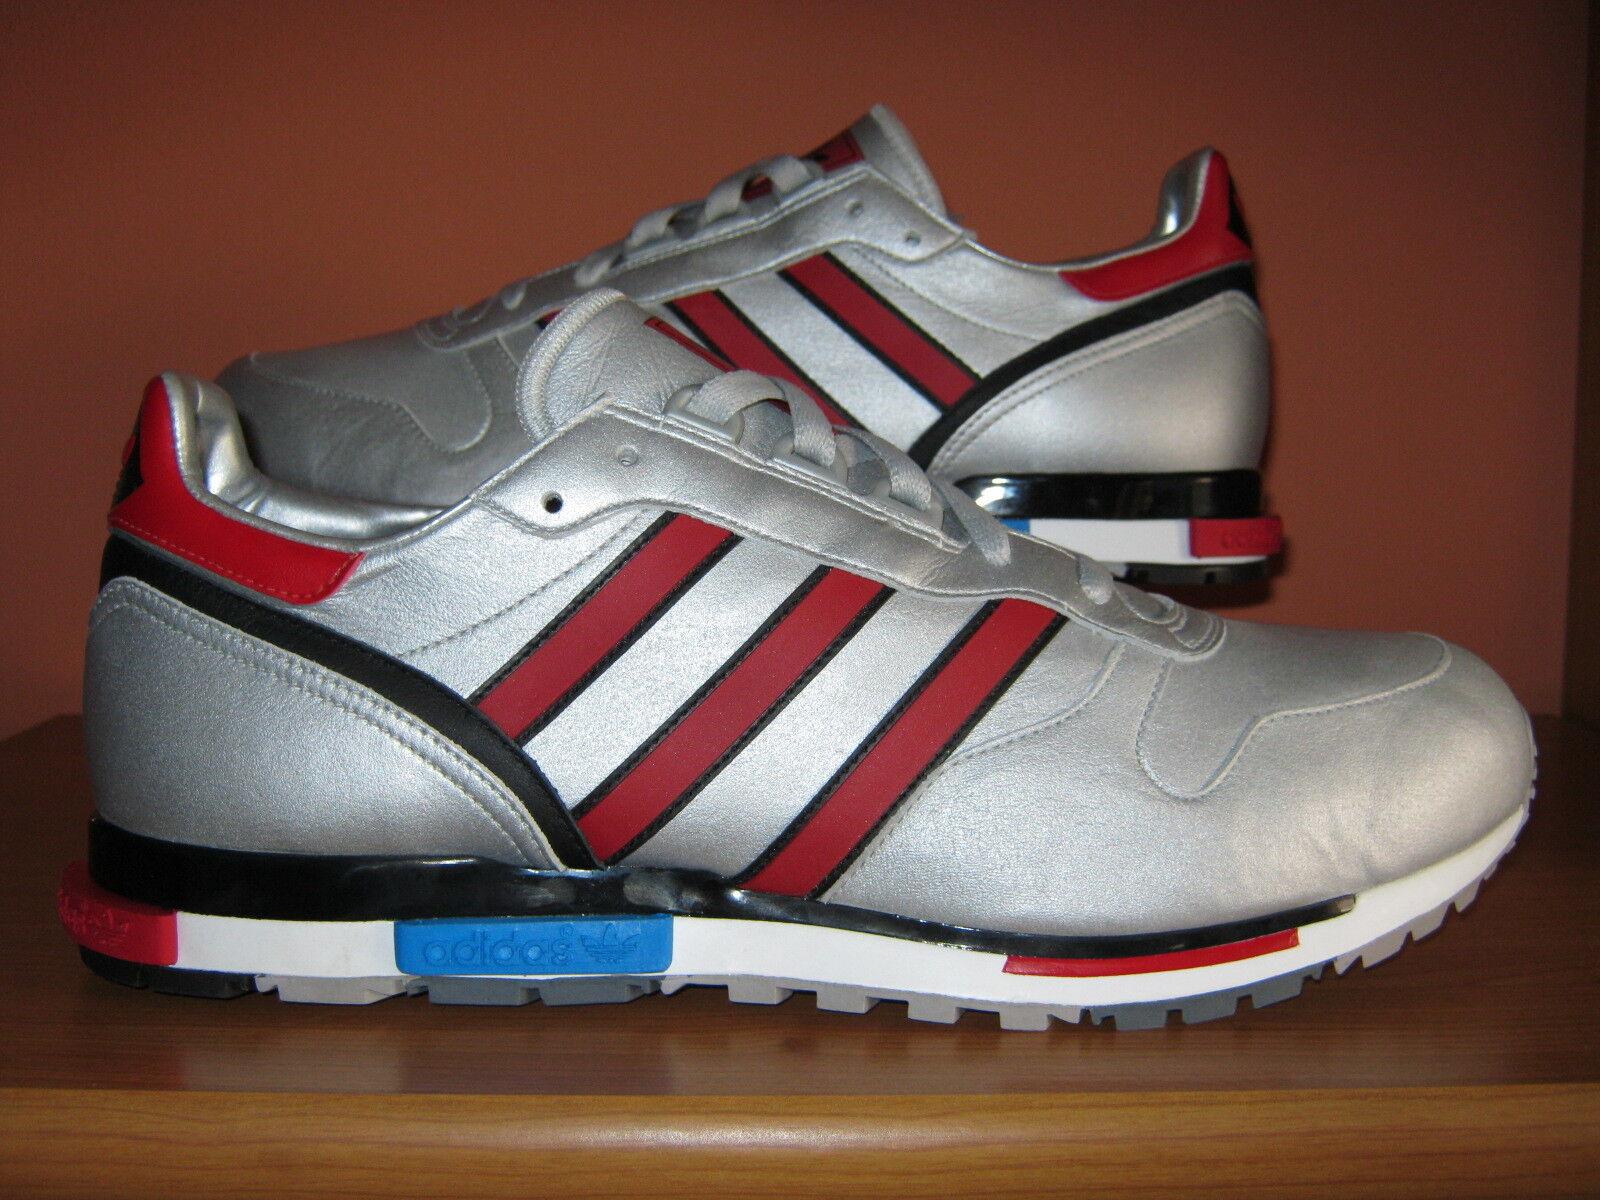 Adidas rising star retro - jahrgang 2004 hause box new in box hause uns 11,5 fr 46 6dc86a